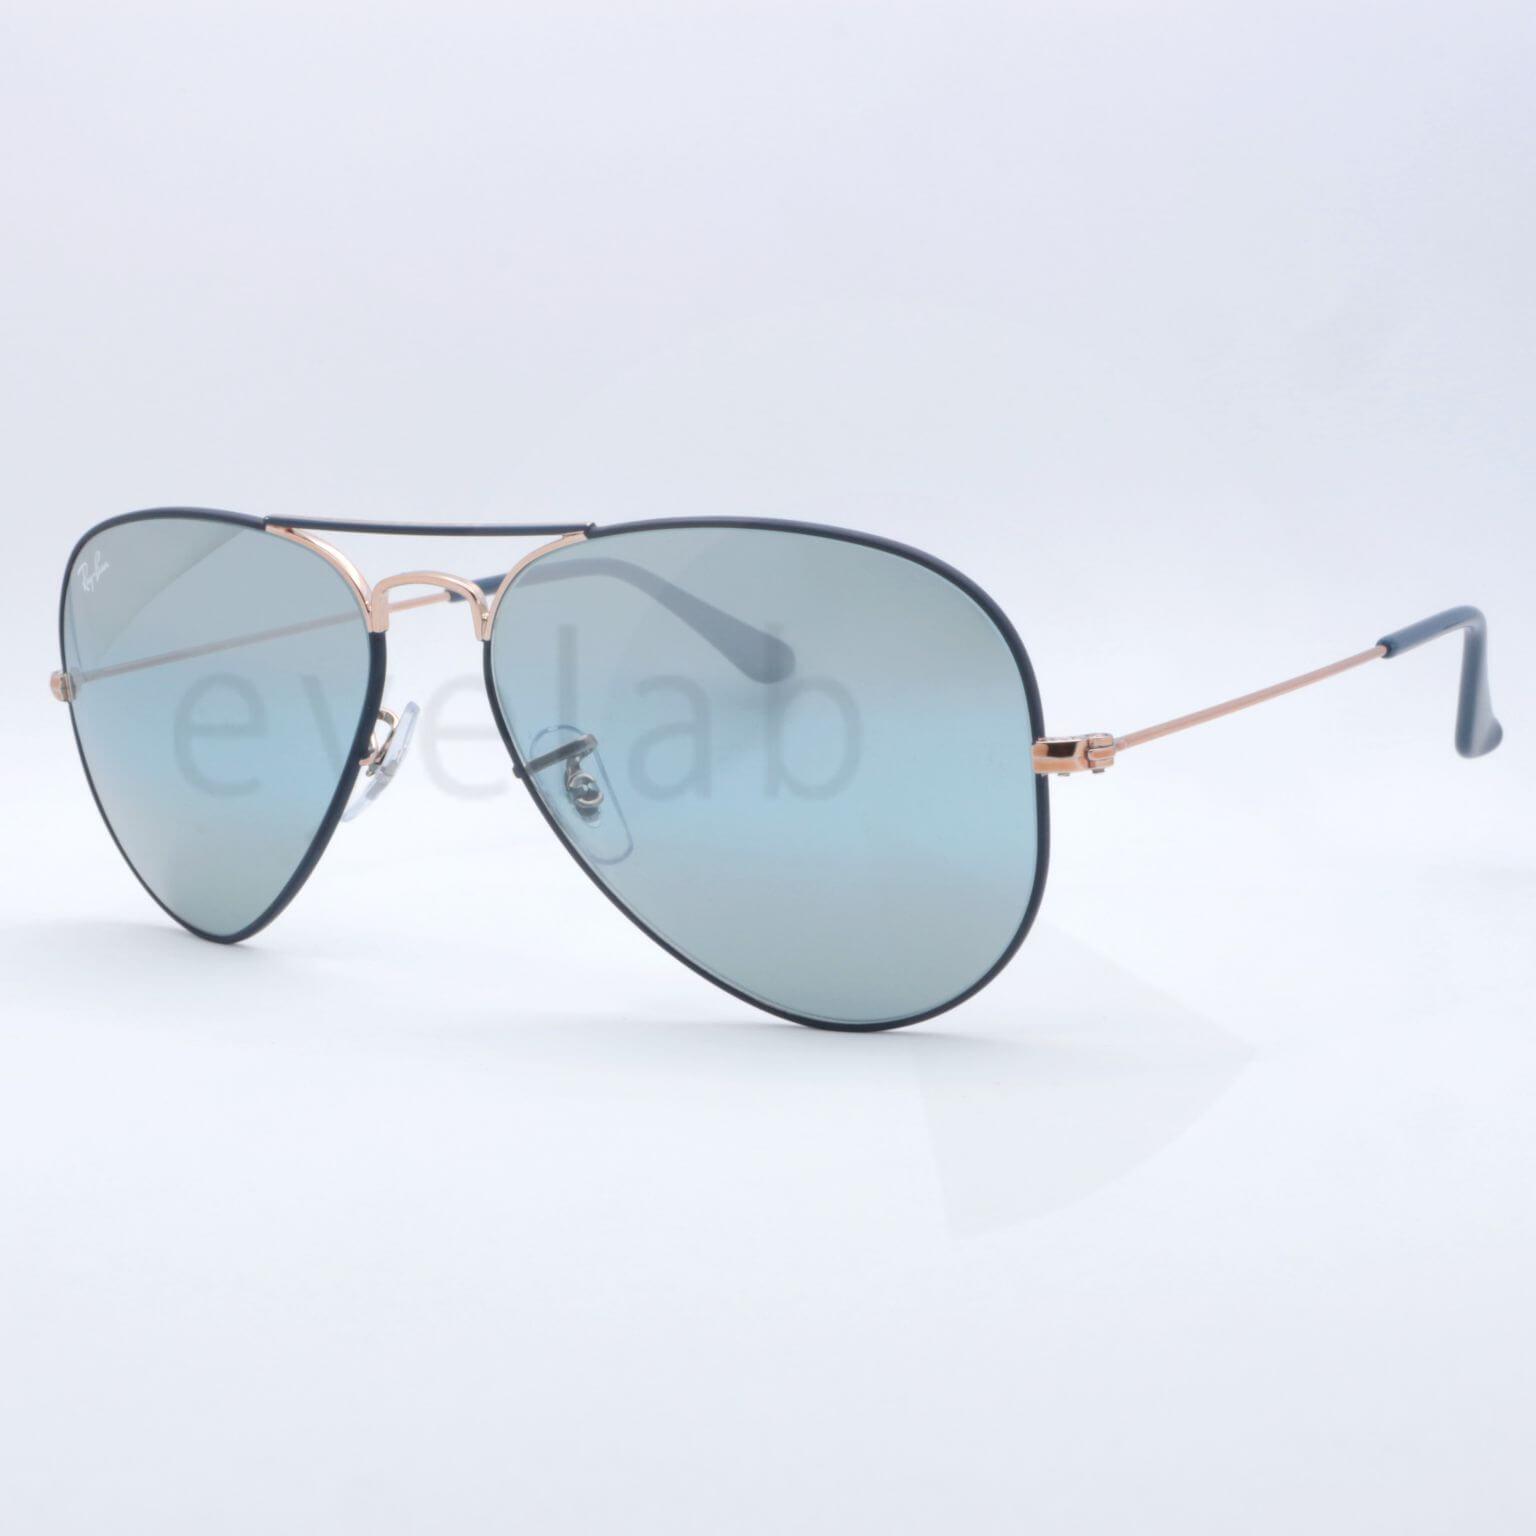 419d005681 Ray-Ban Aviator 3025 9156AJ 58 sunglasses ~ Οπτικά Eyelab